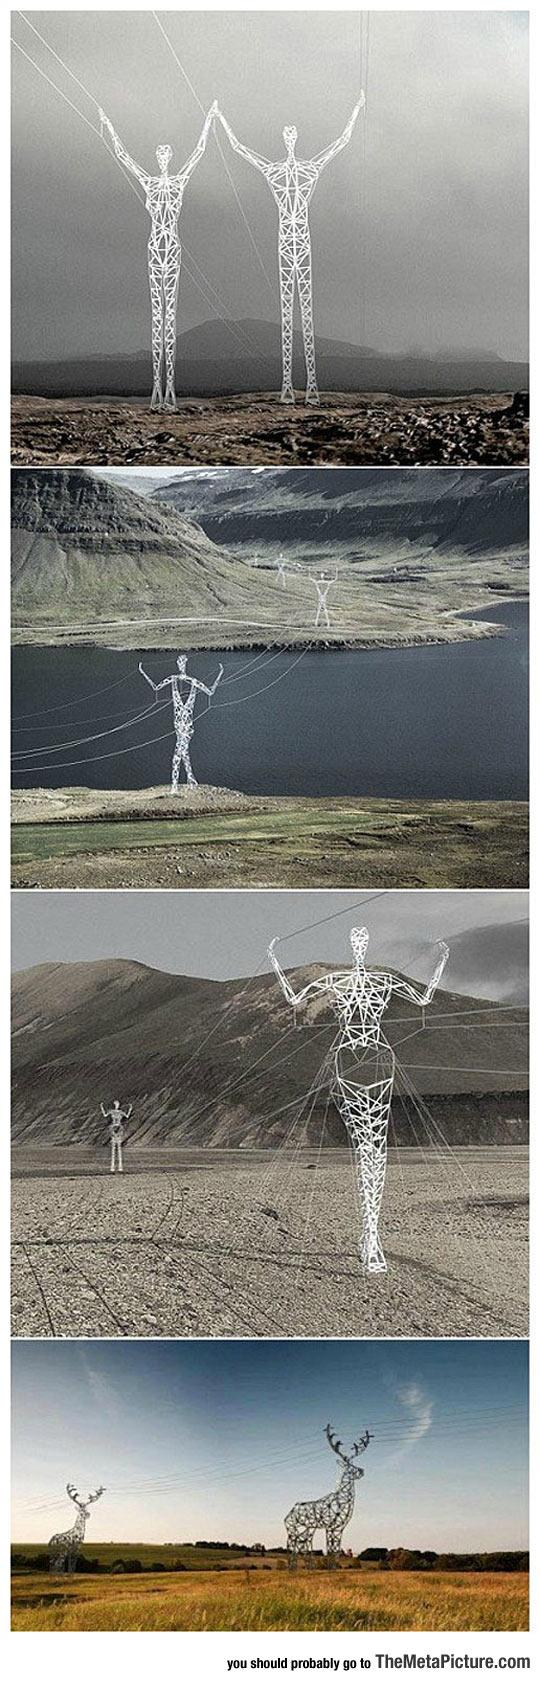 human-shape-electric-towers-Iceland